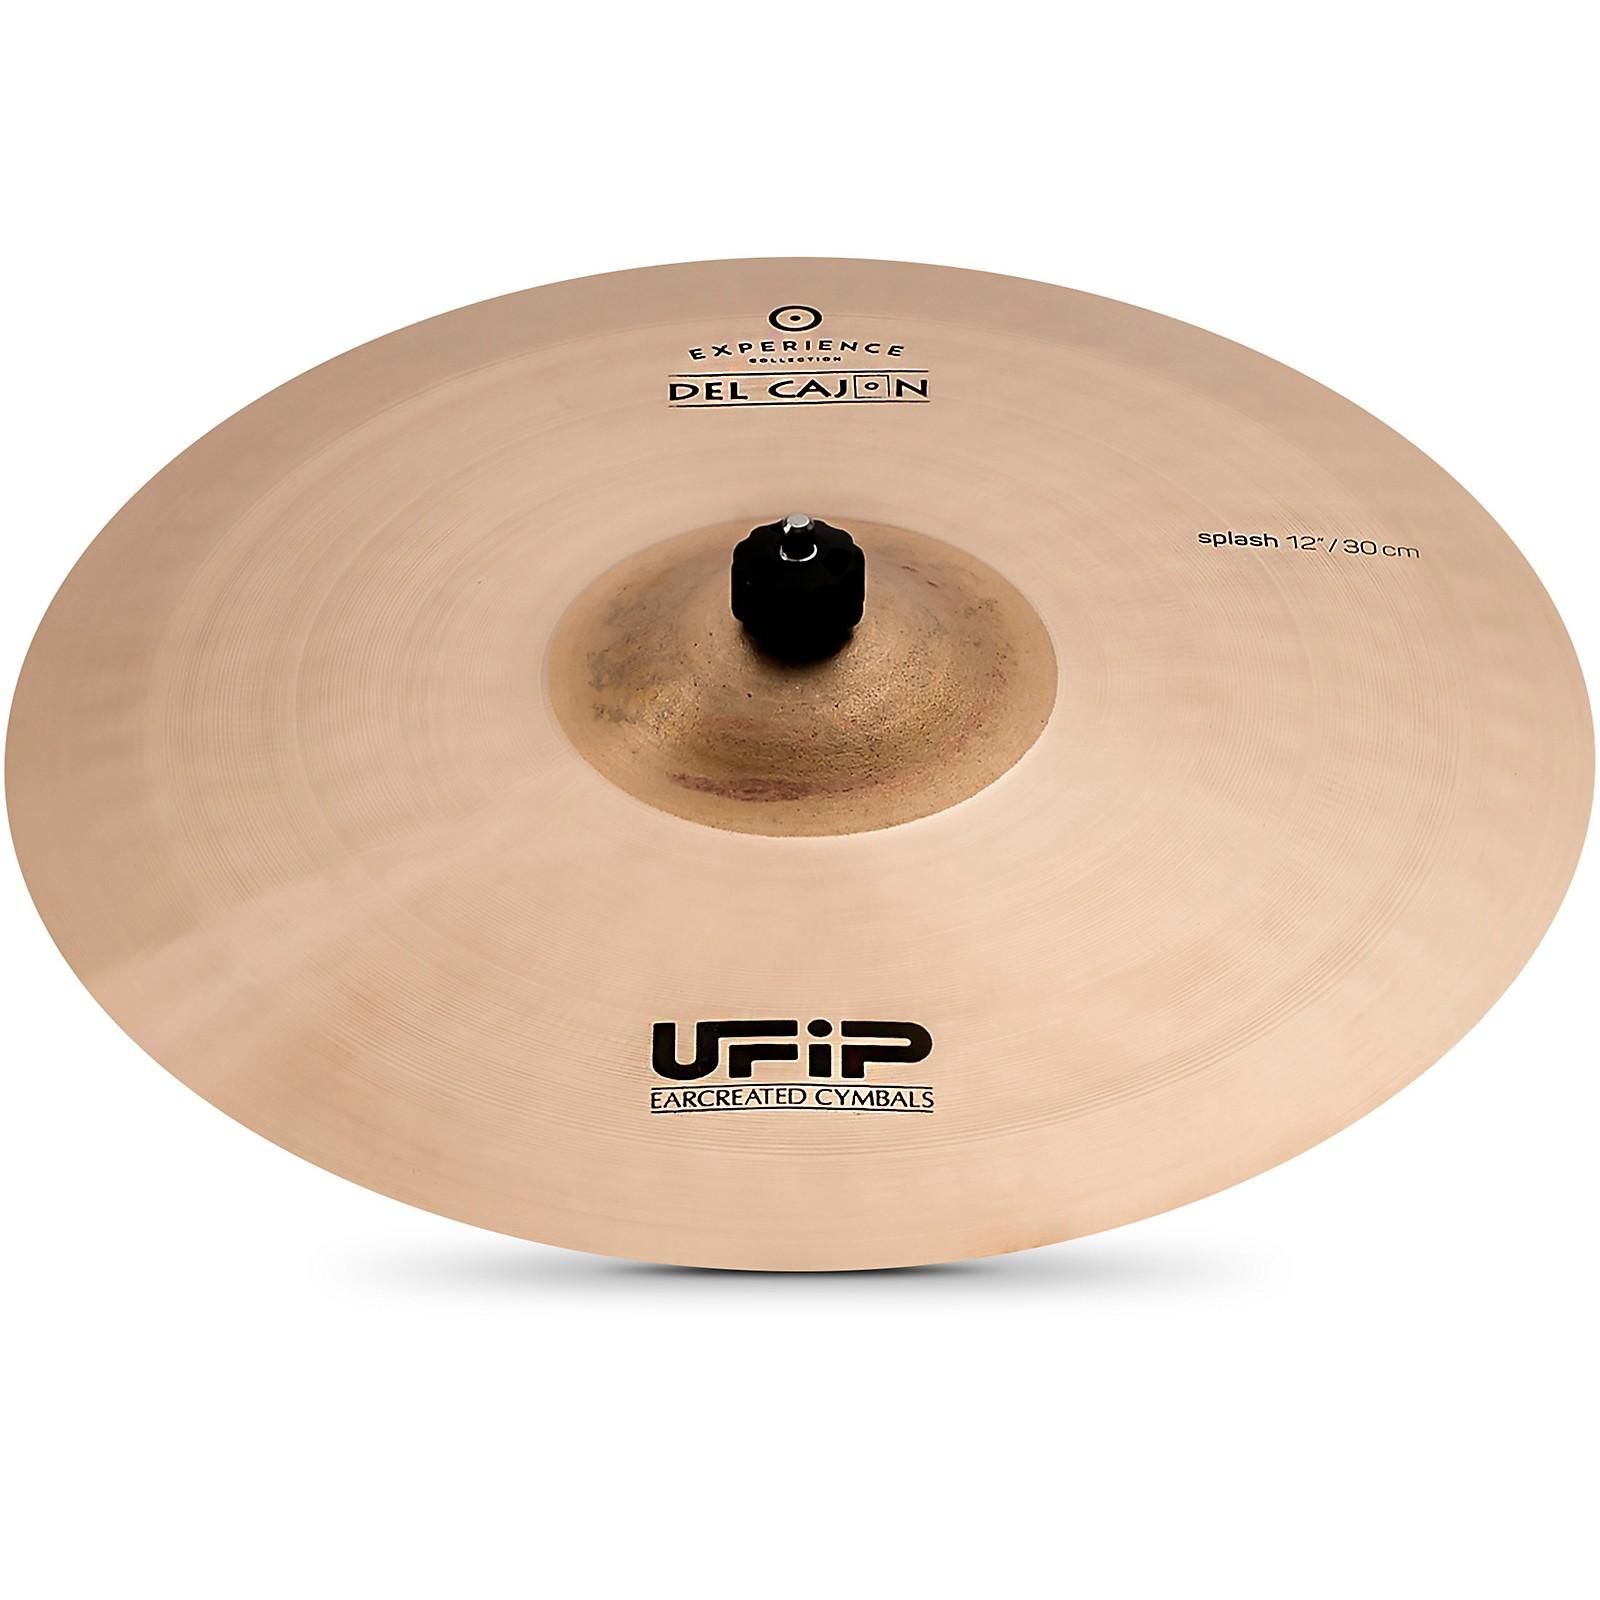 UFIP Experience Series Del Cajon Splash Cymbal